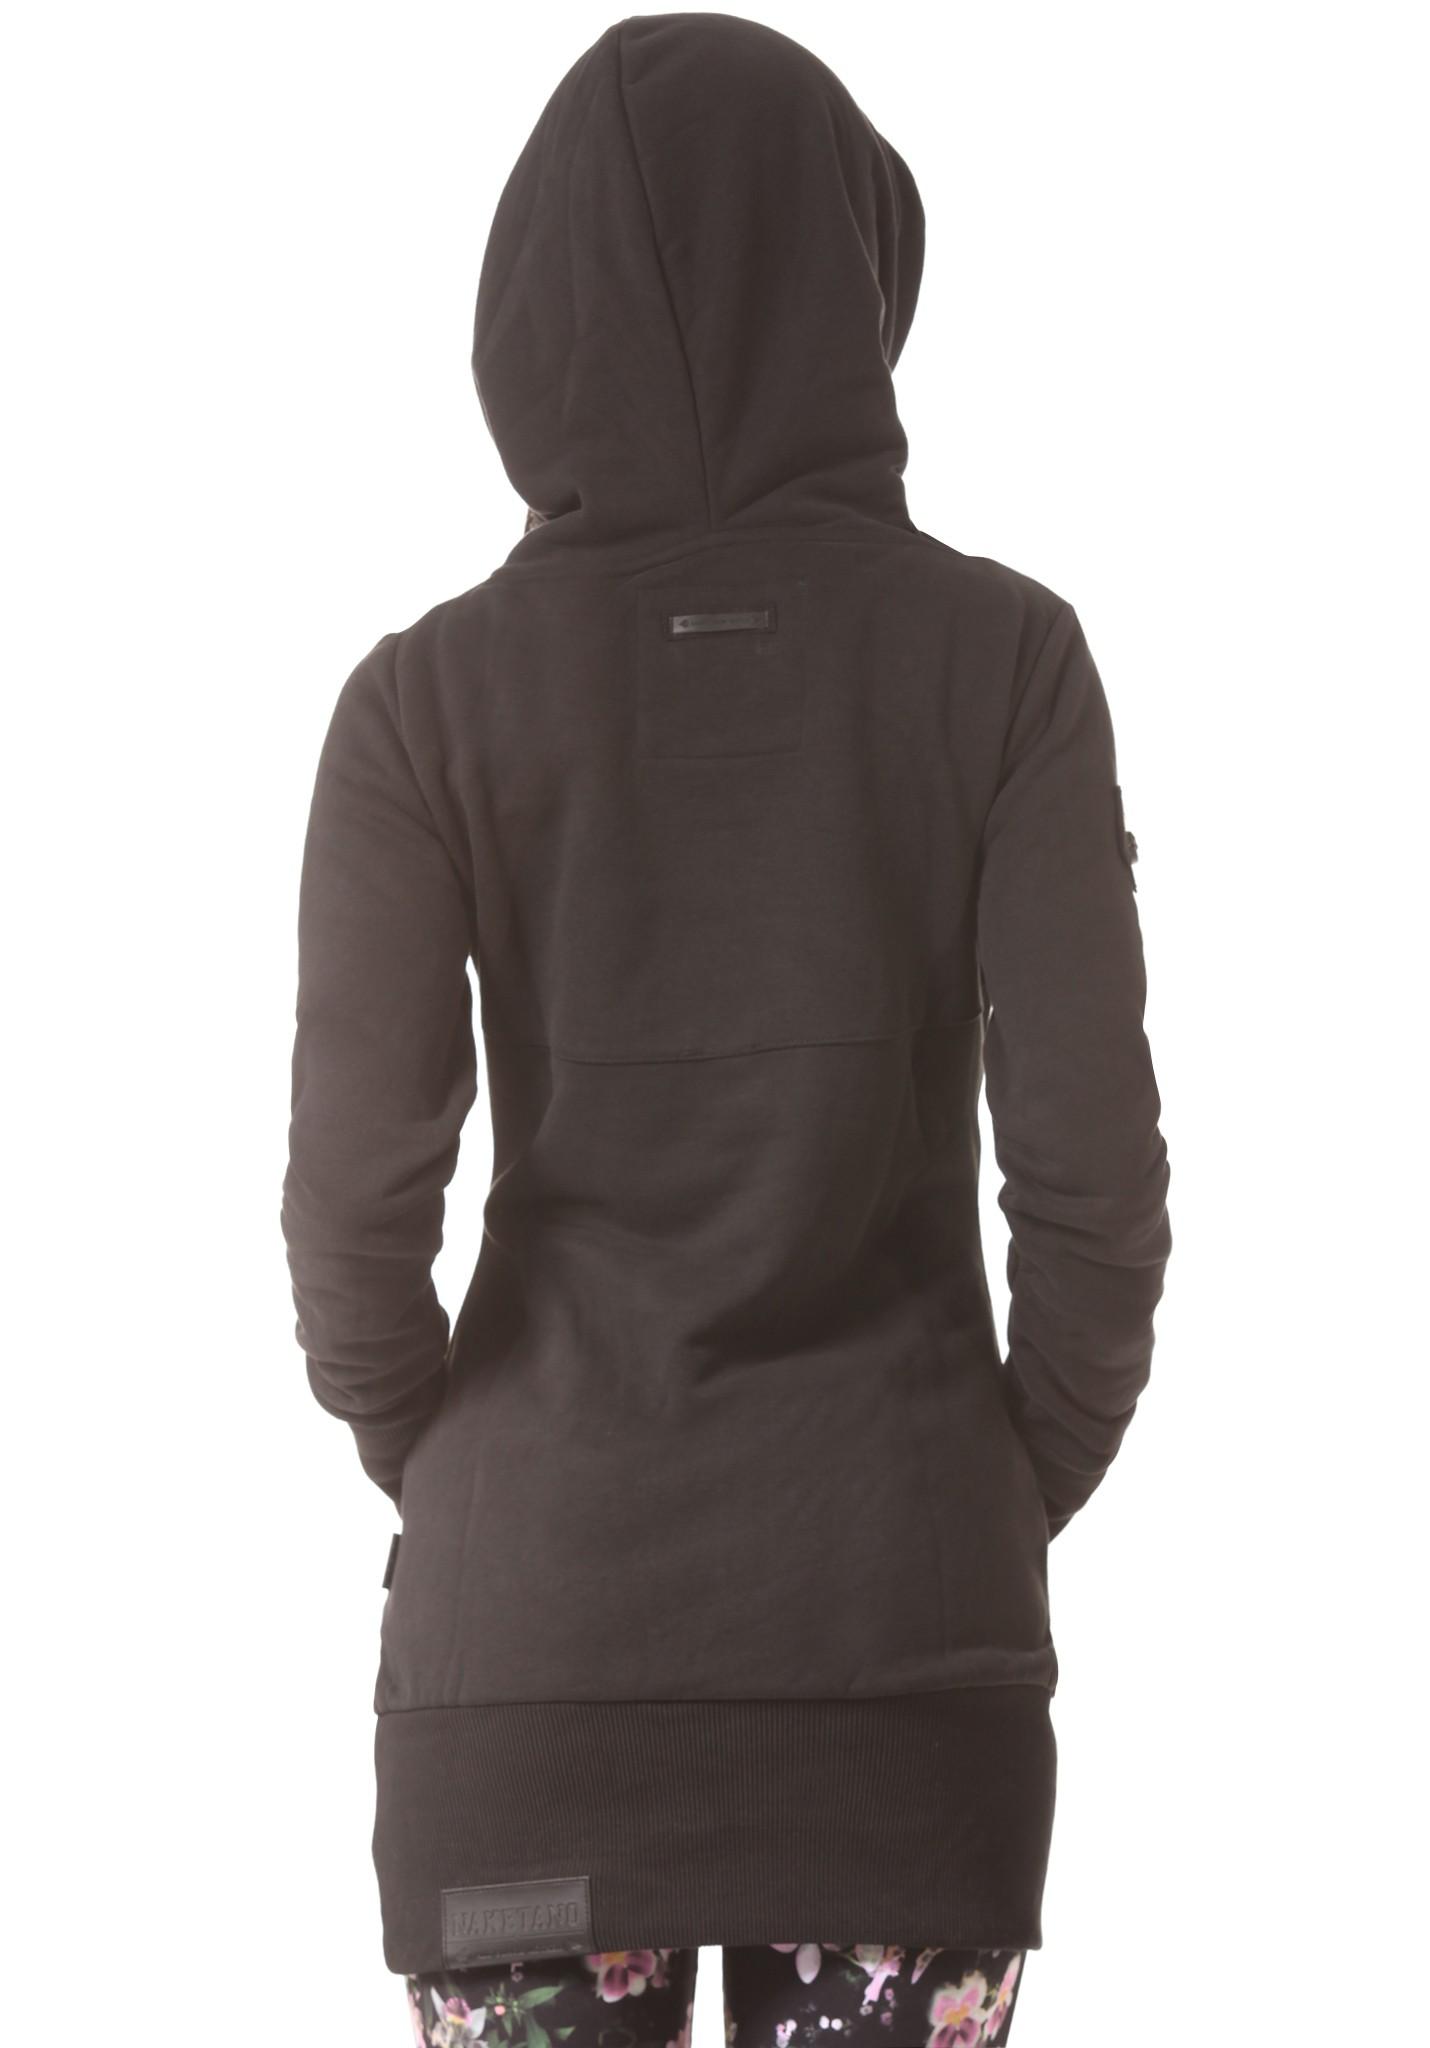 neu naketano lange damen kapuzenpullover pullover hoodie. Black Bedroom Furniture Sets. Home Design Ideas